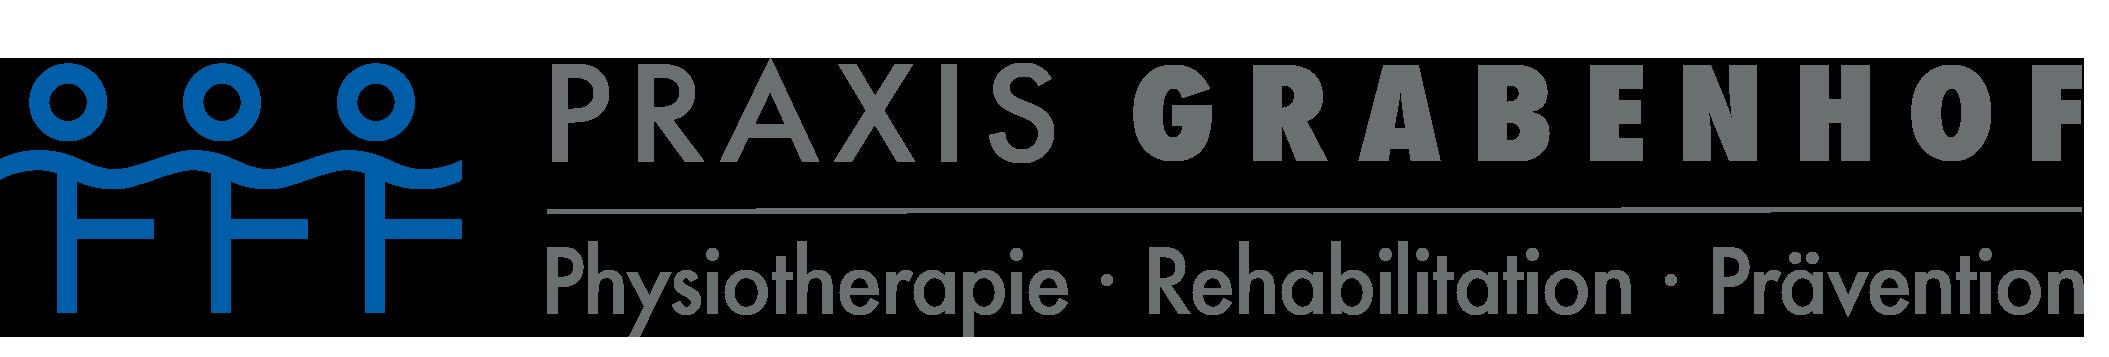 Praxis Grabenhof